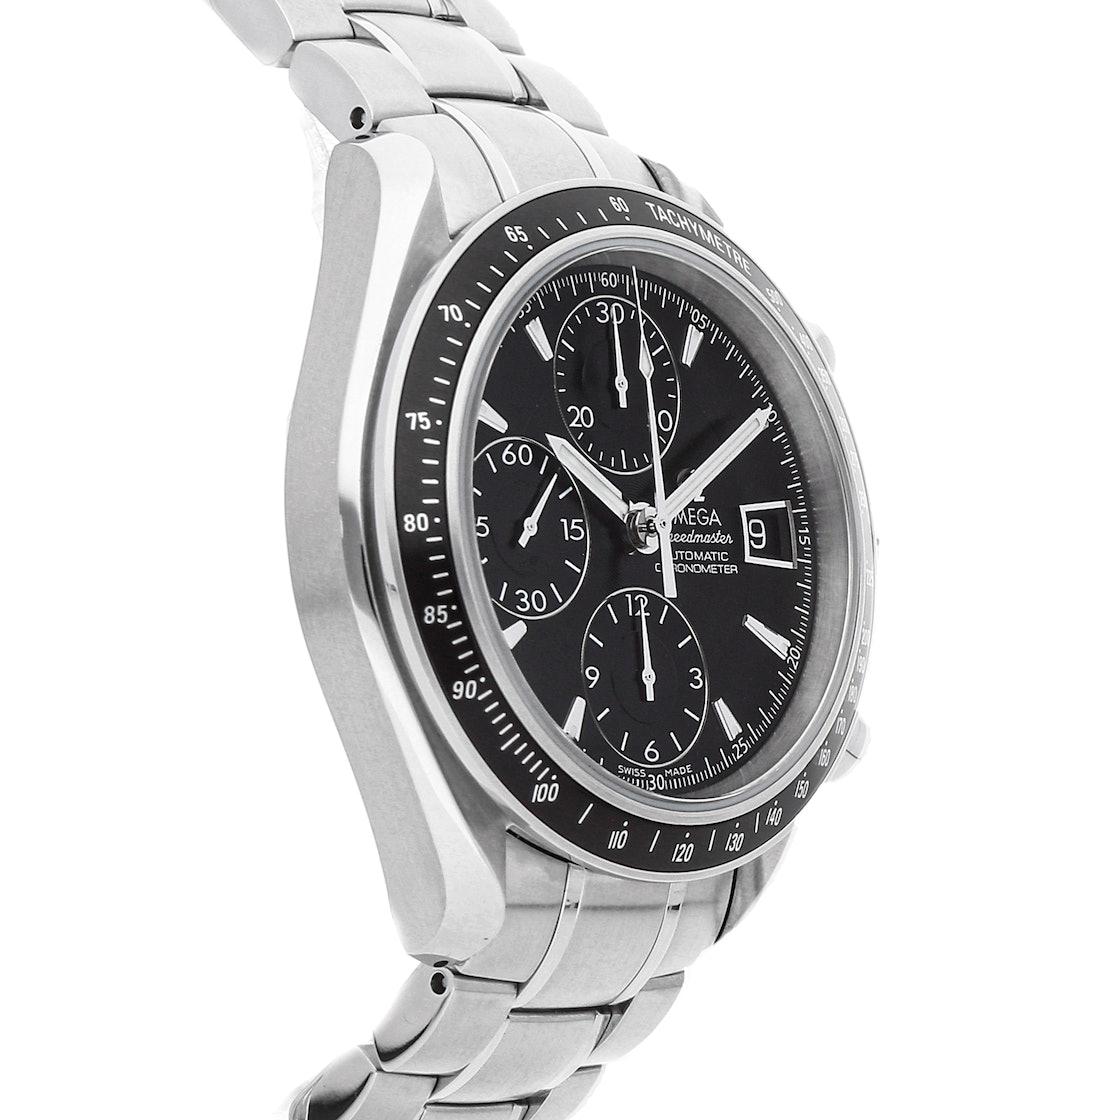 Omega Speedmaster Date Chronograph 3210.50.00